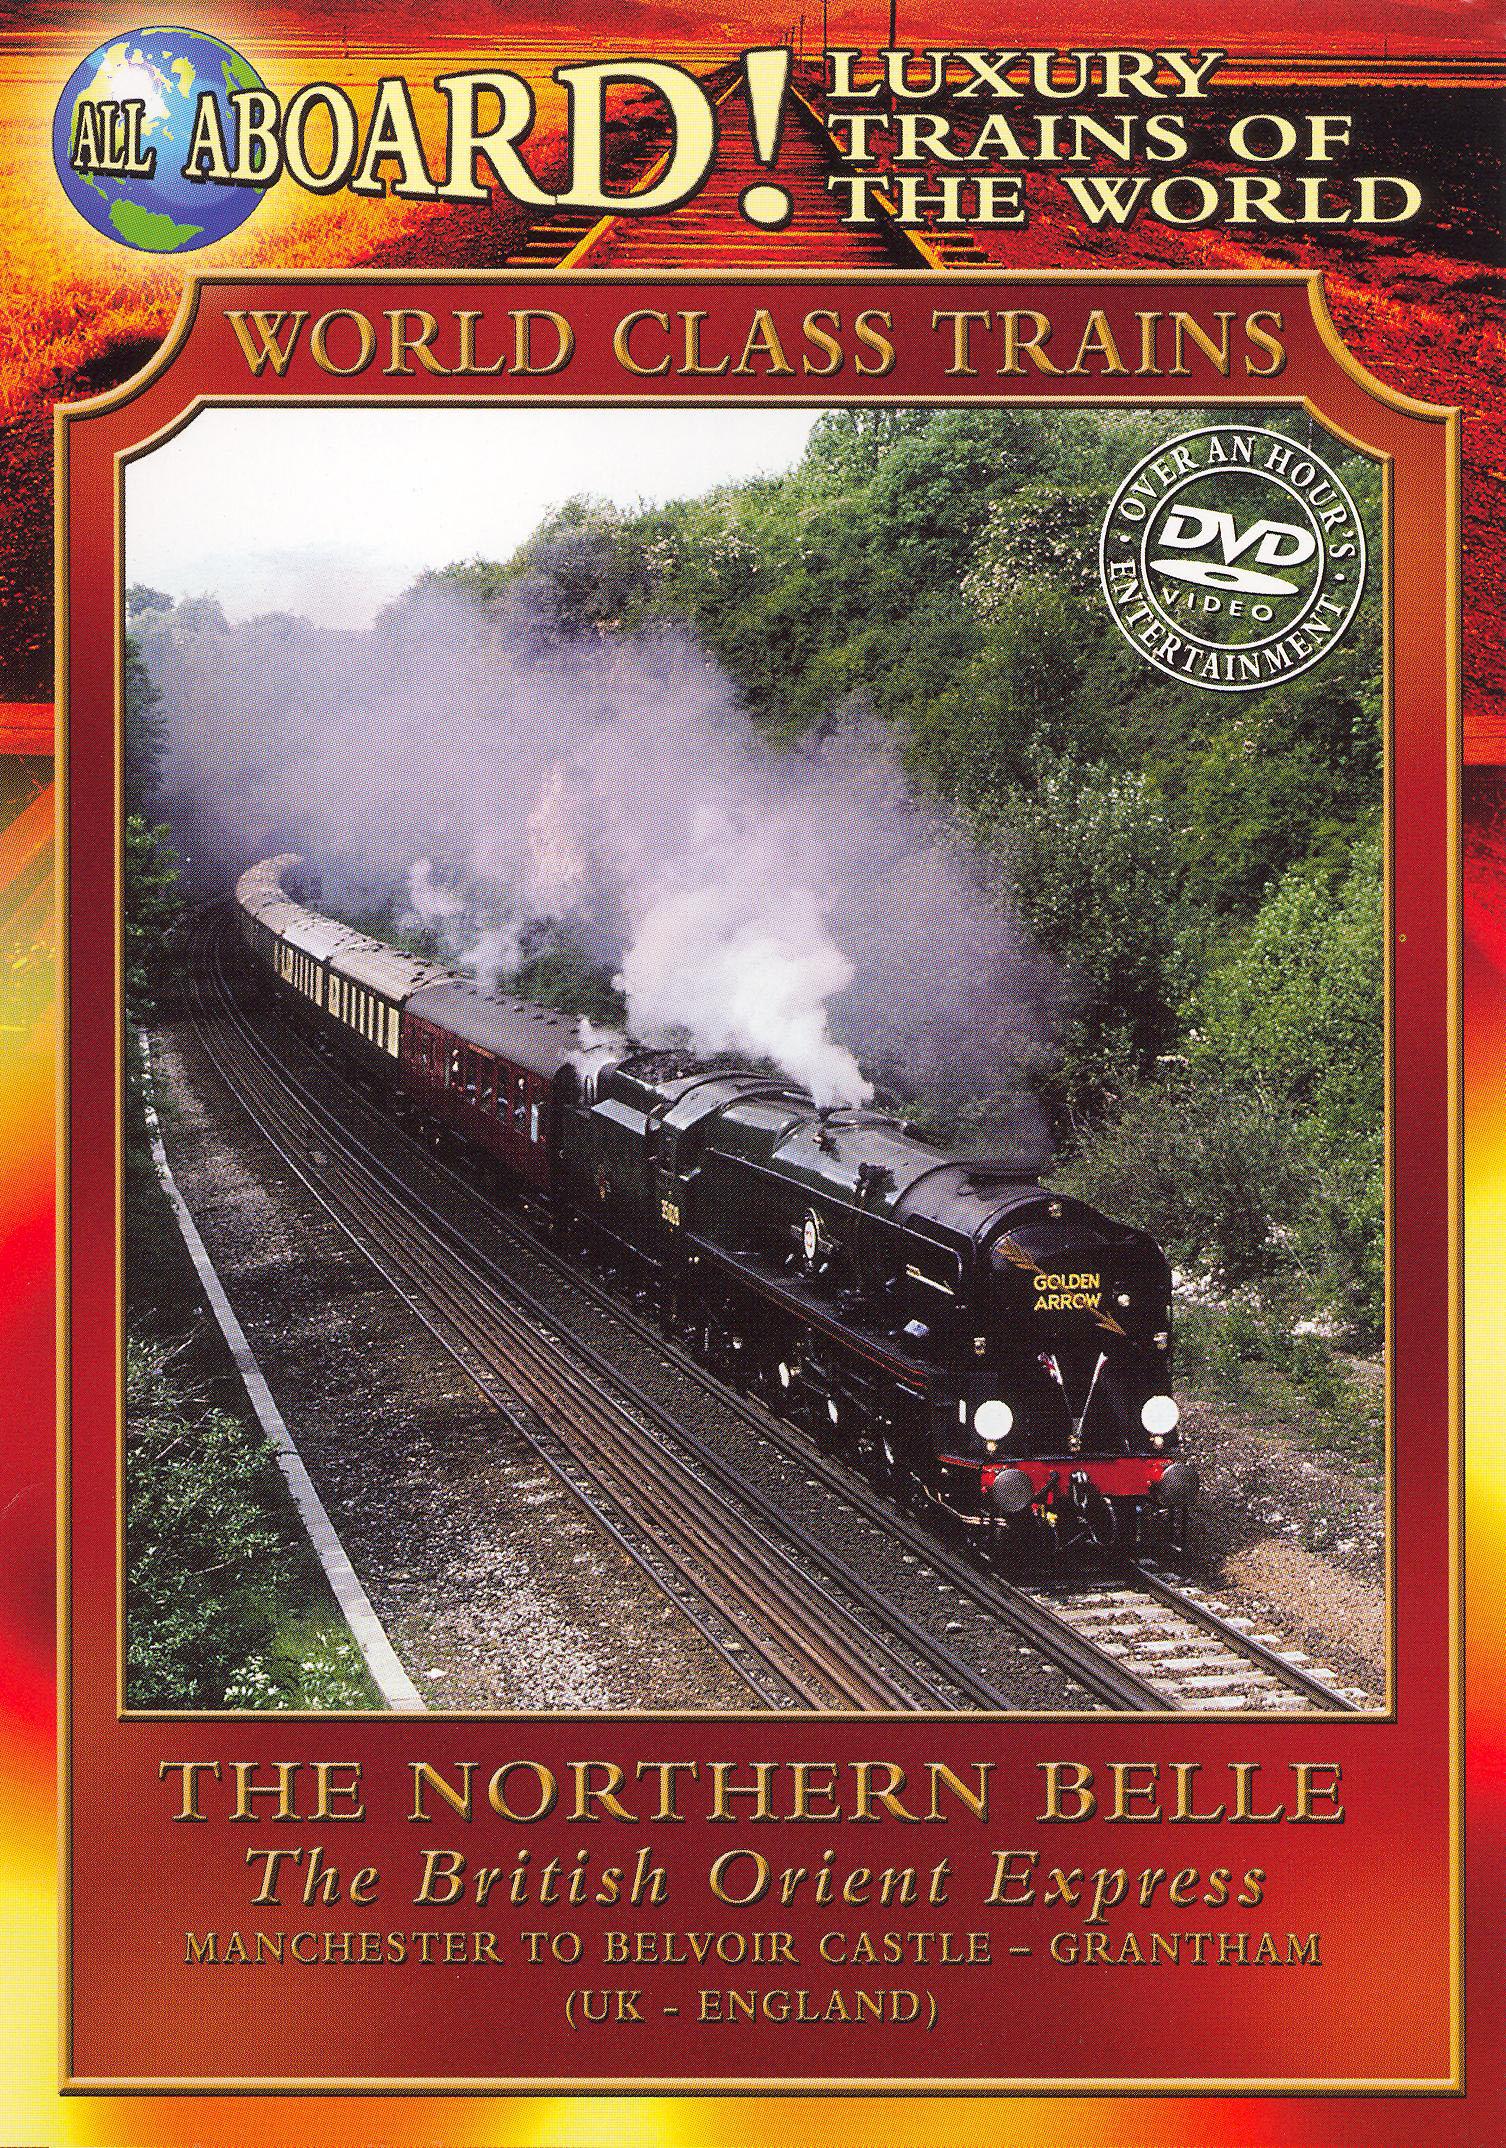 World Class Trains: The Northern Belle - British Orient Express